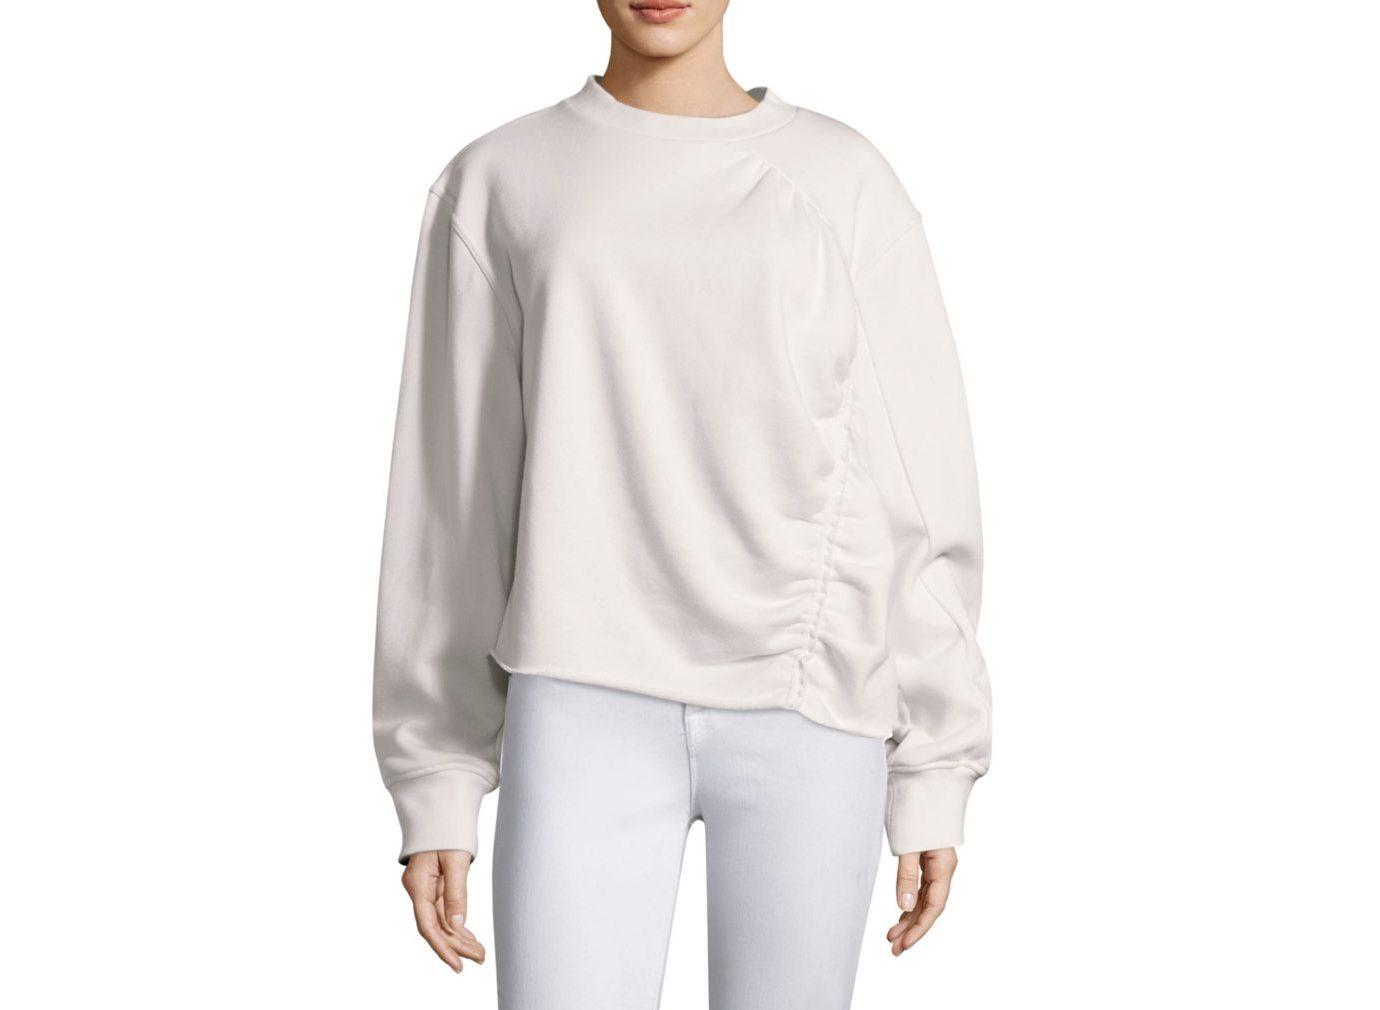 best sweatshirts, Public School Ashlei French Terry sweatshirt